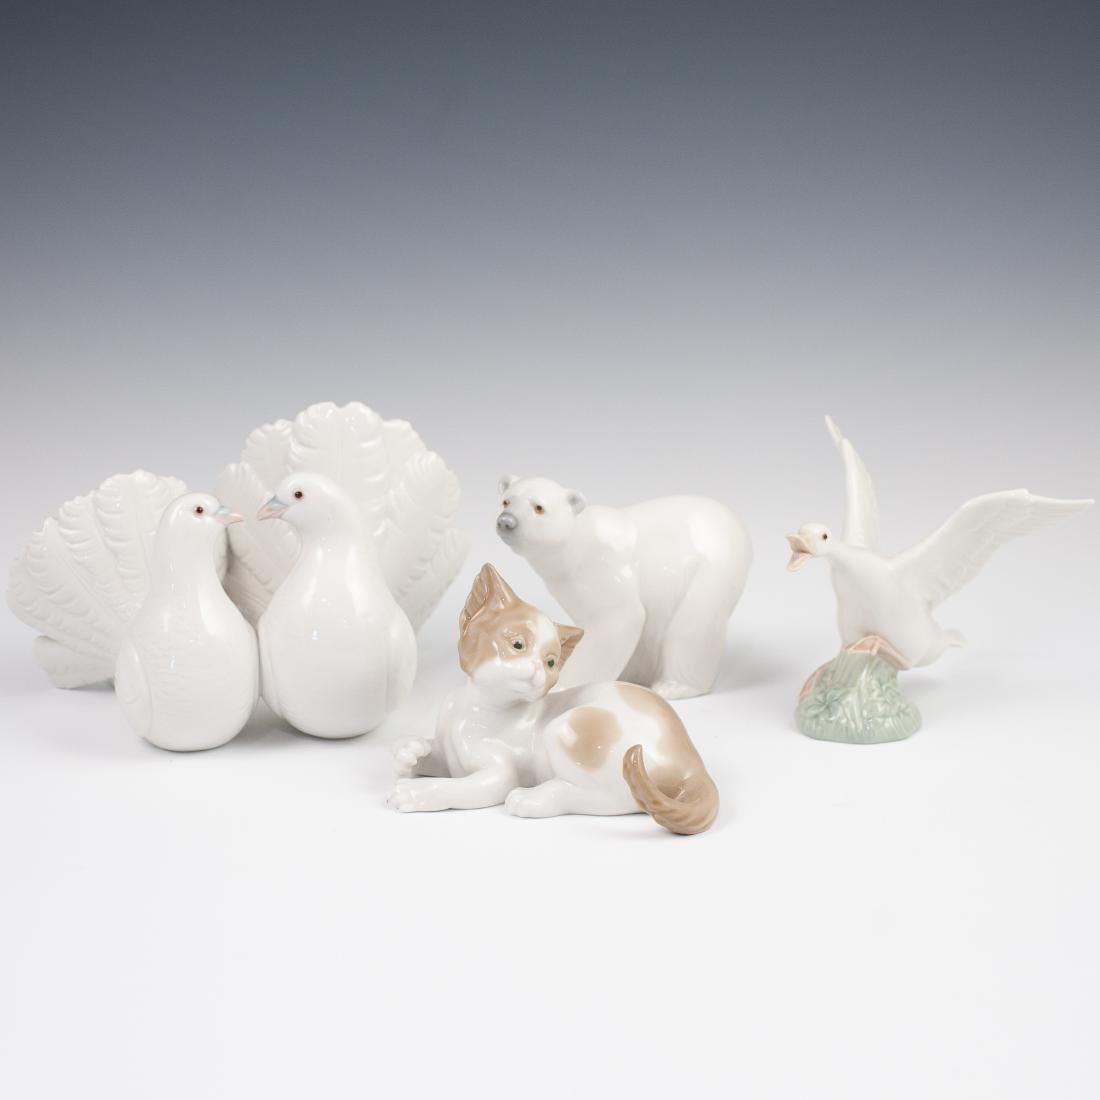 (4) Vintage Porcelain Lladro Figurines